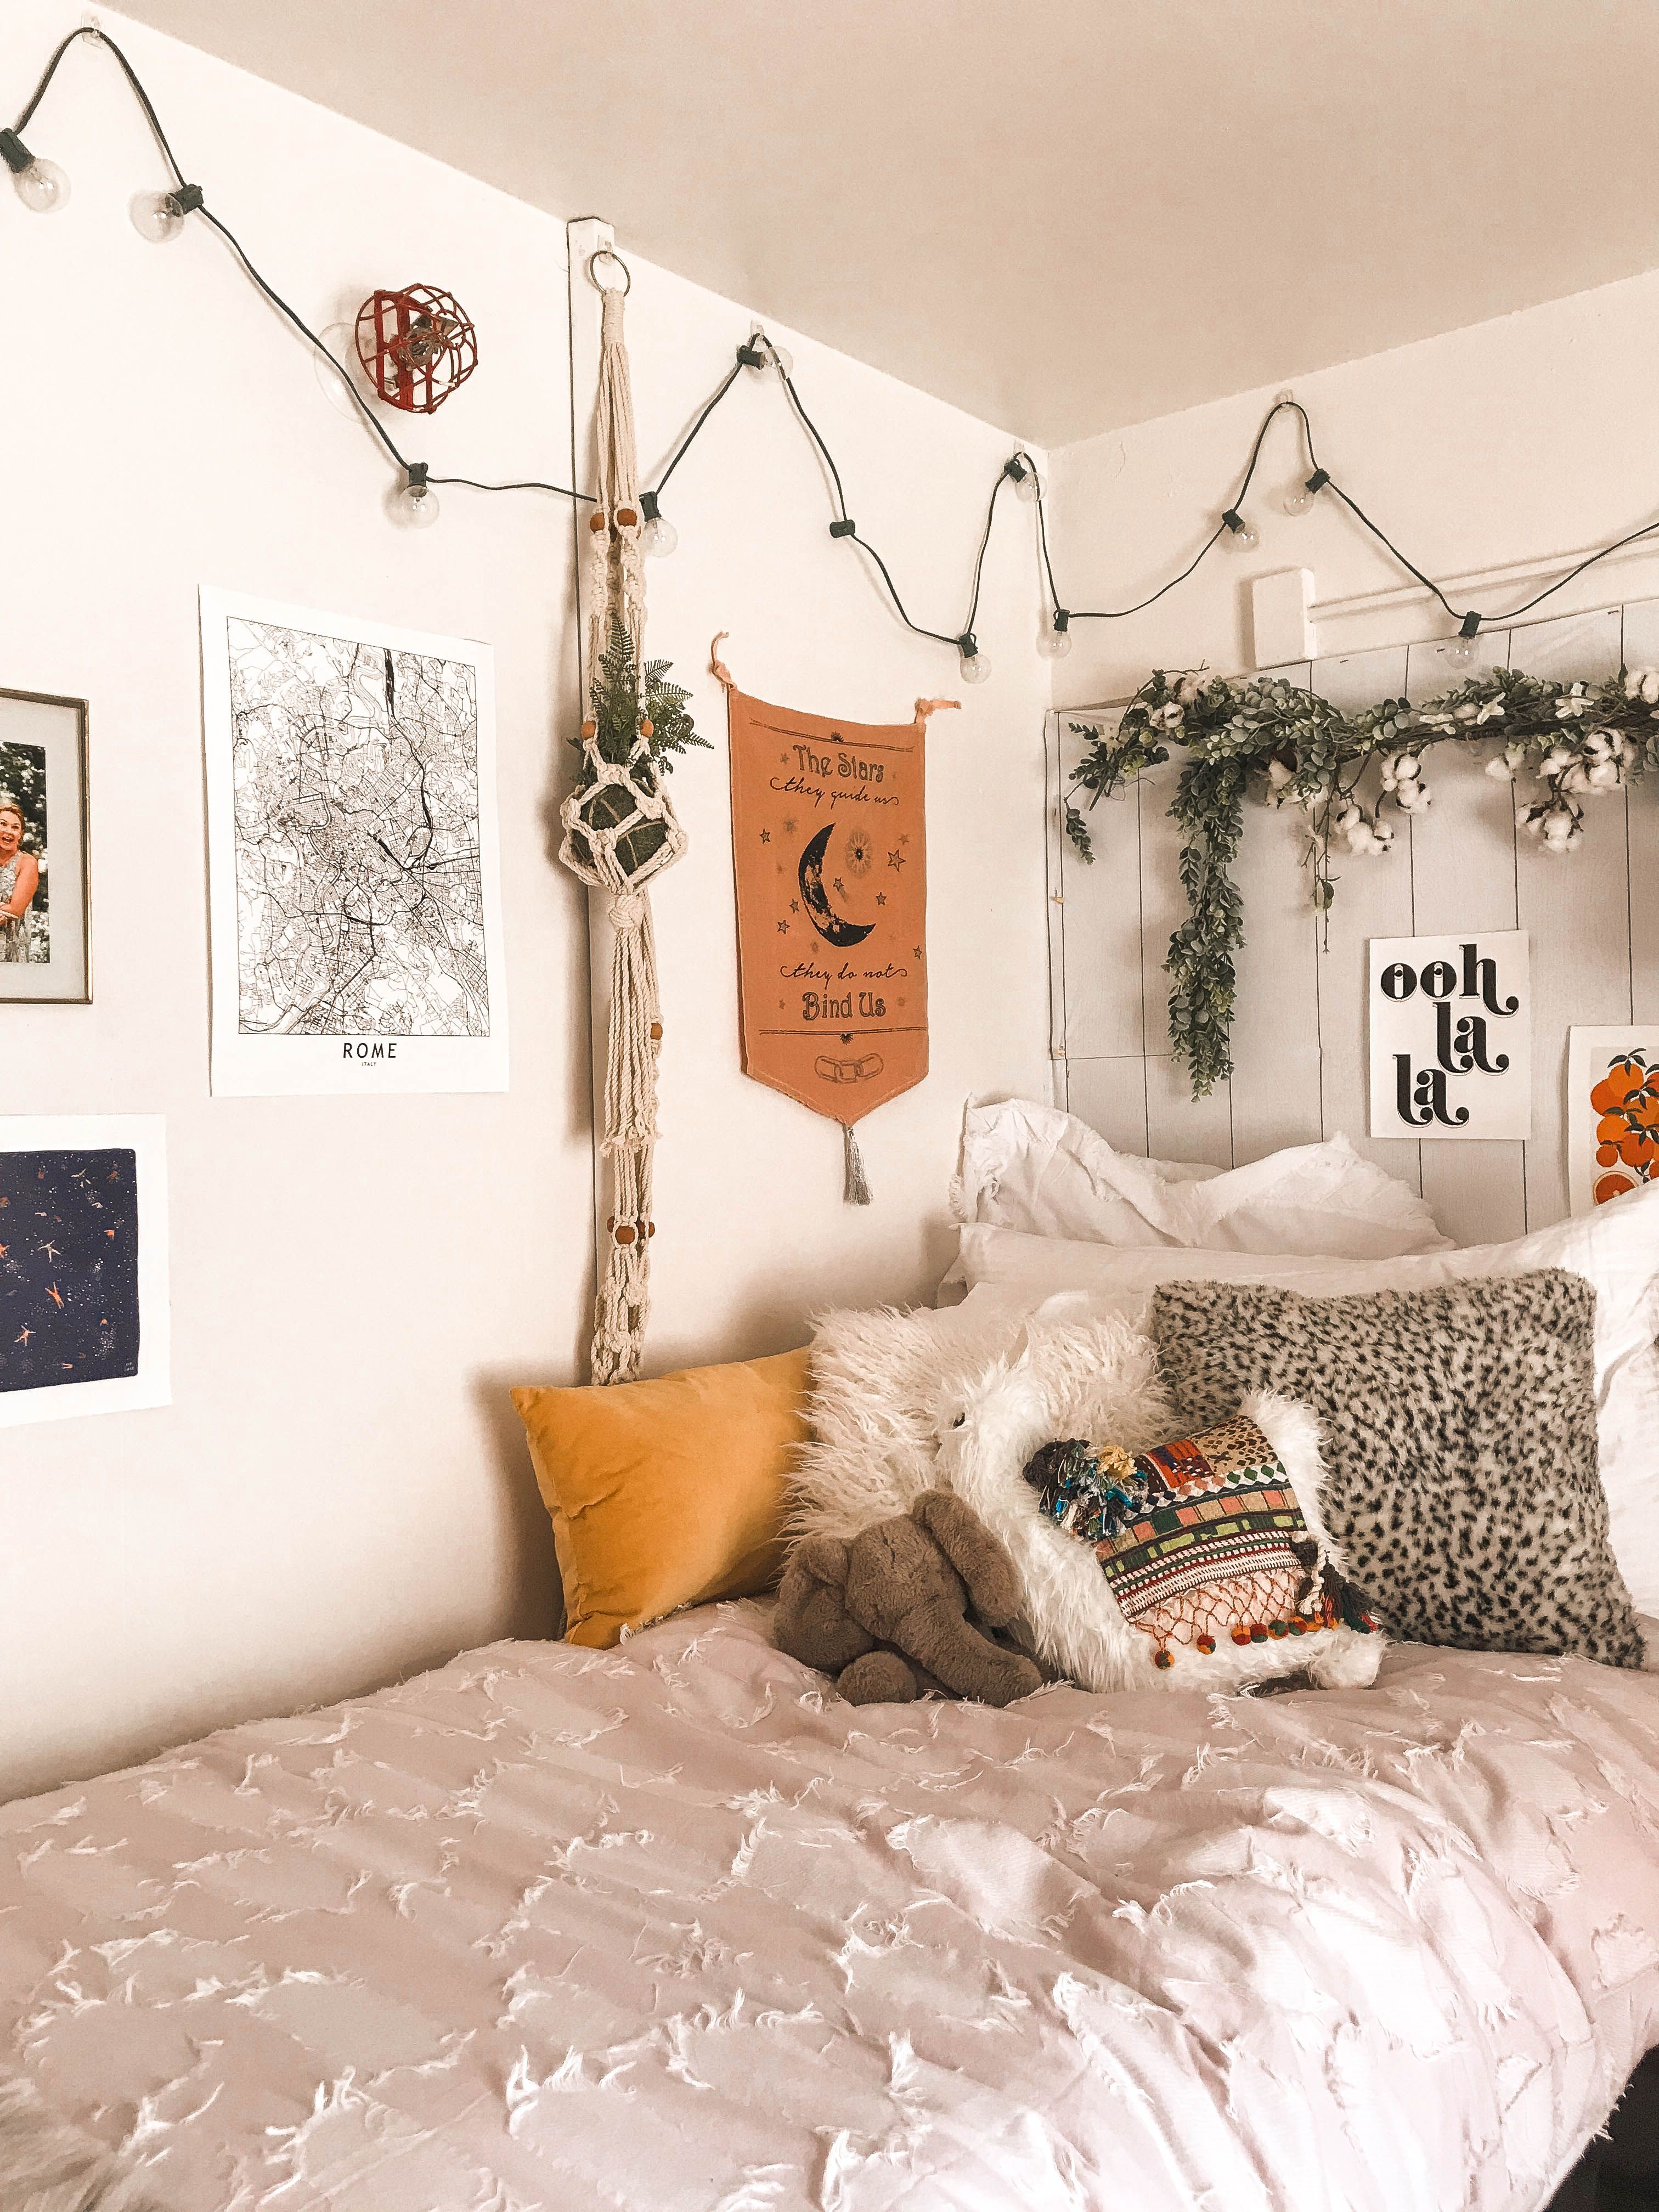 Quartos tumblr girl dorm rooms boho room goals flower also designs college in pinterest rh